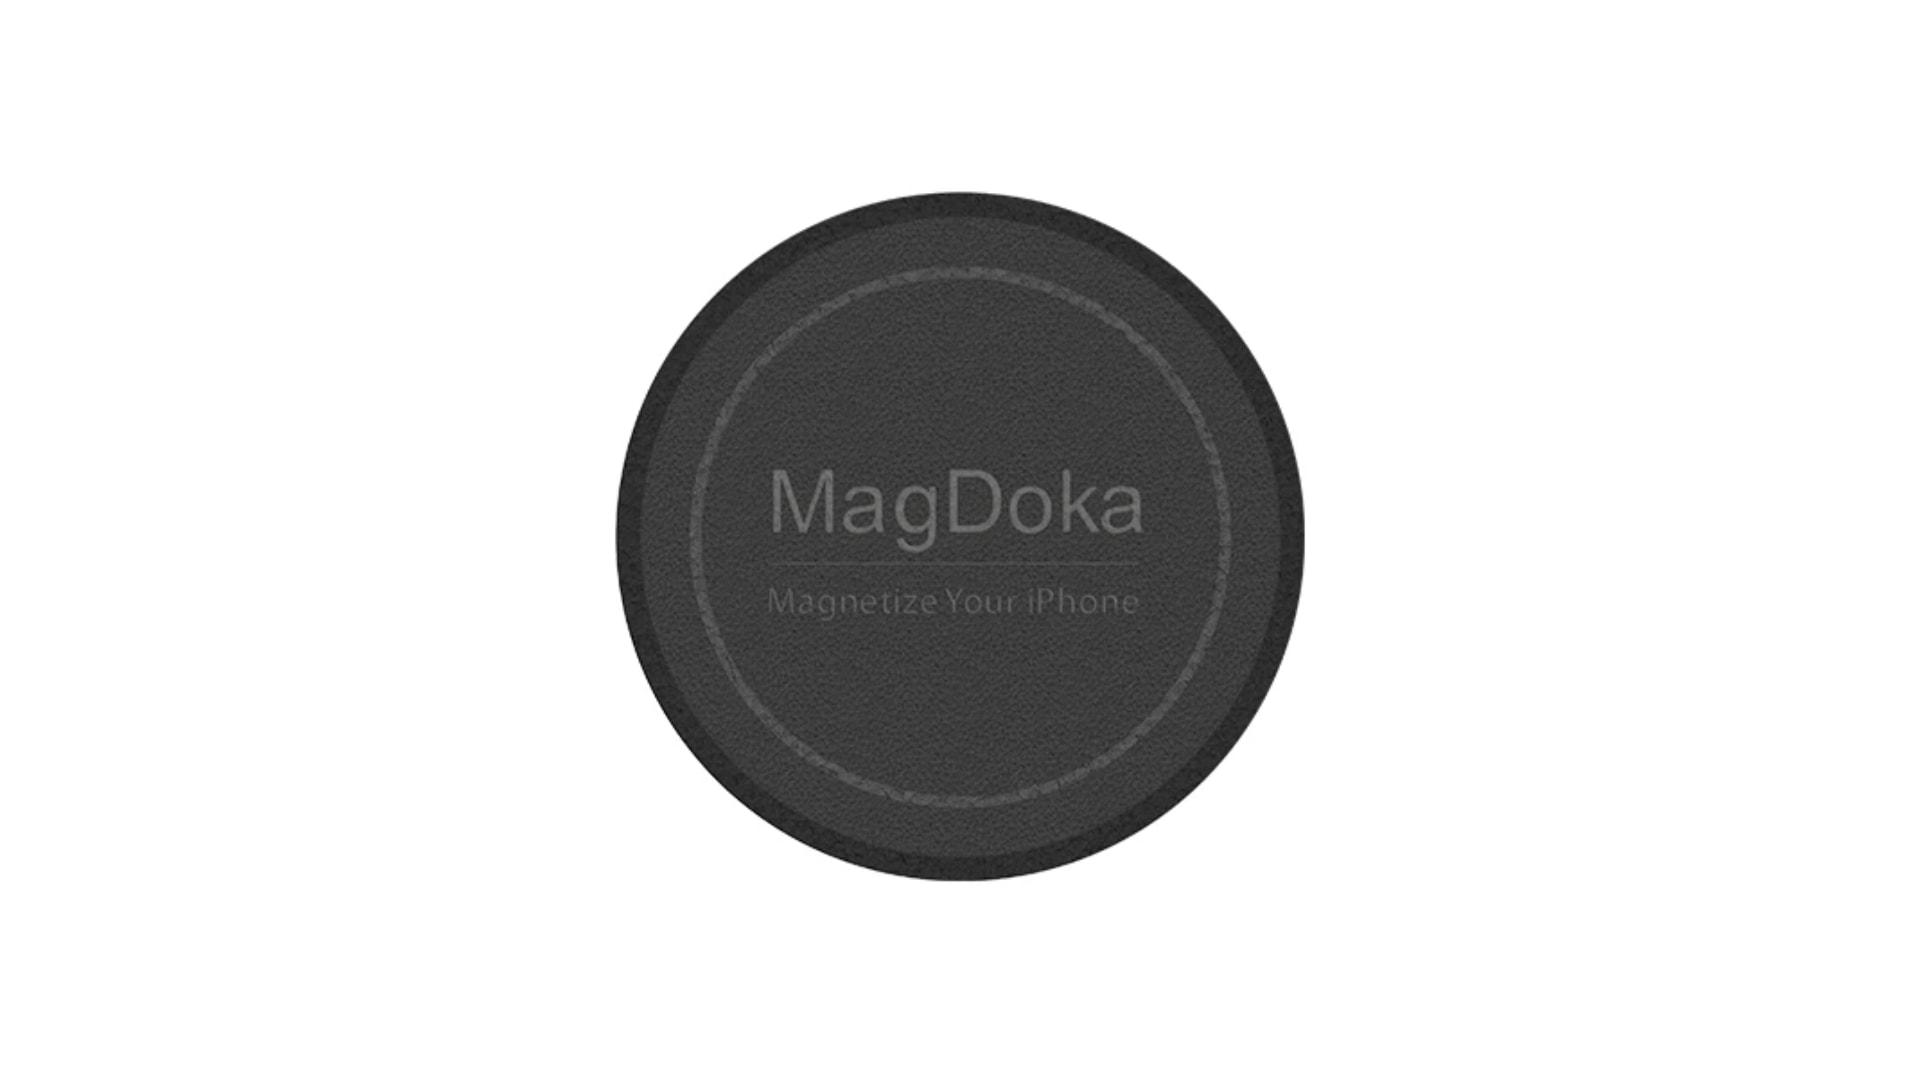 MagDoka for iPhone